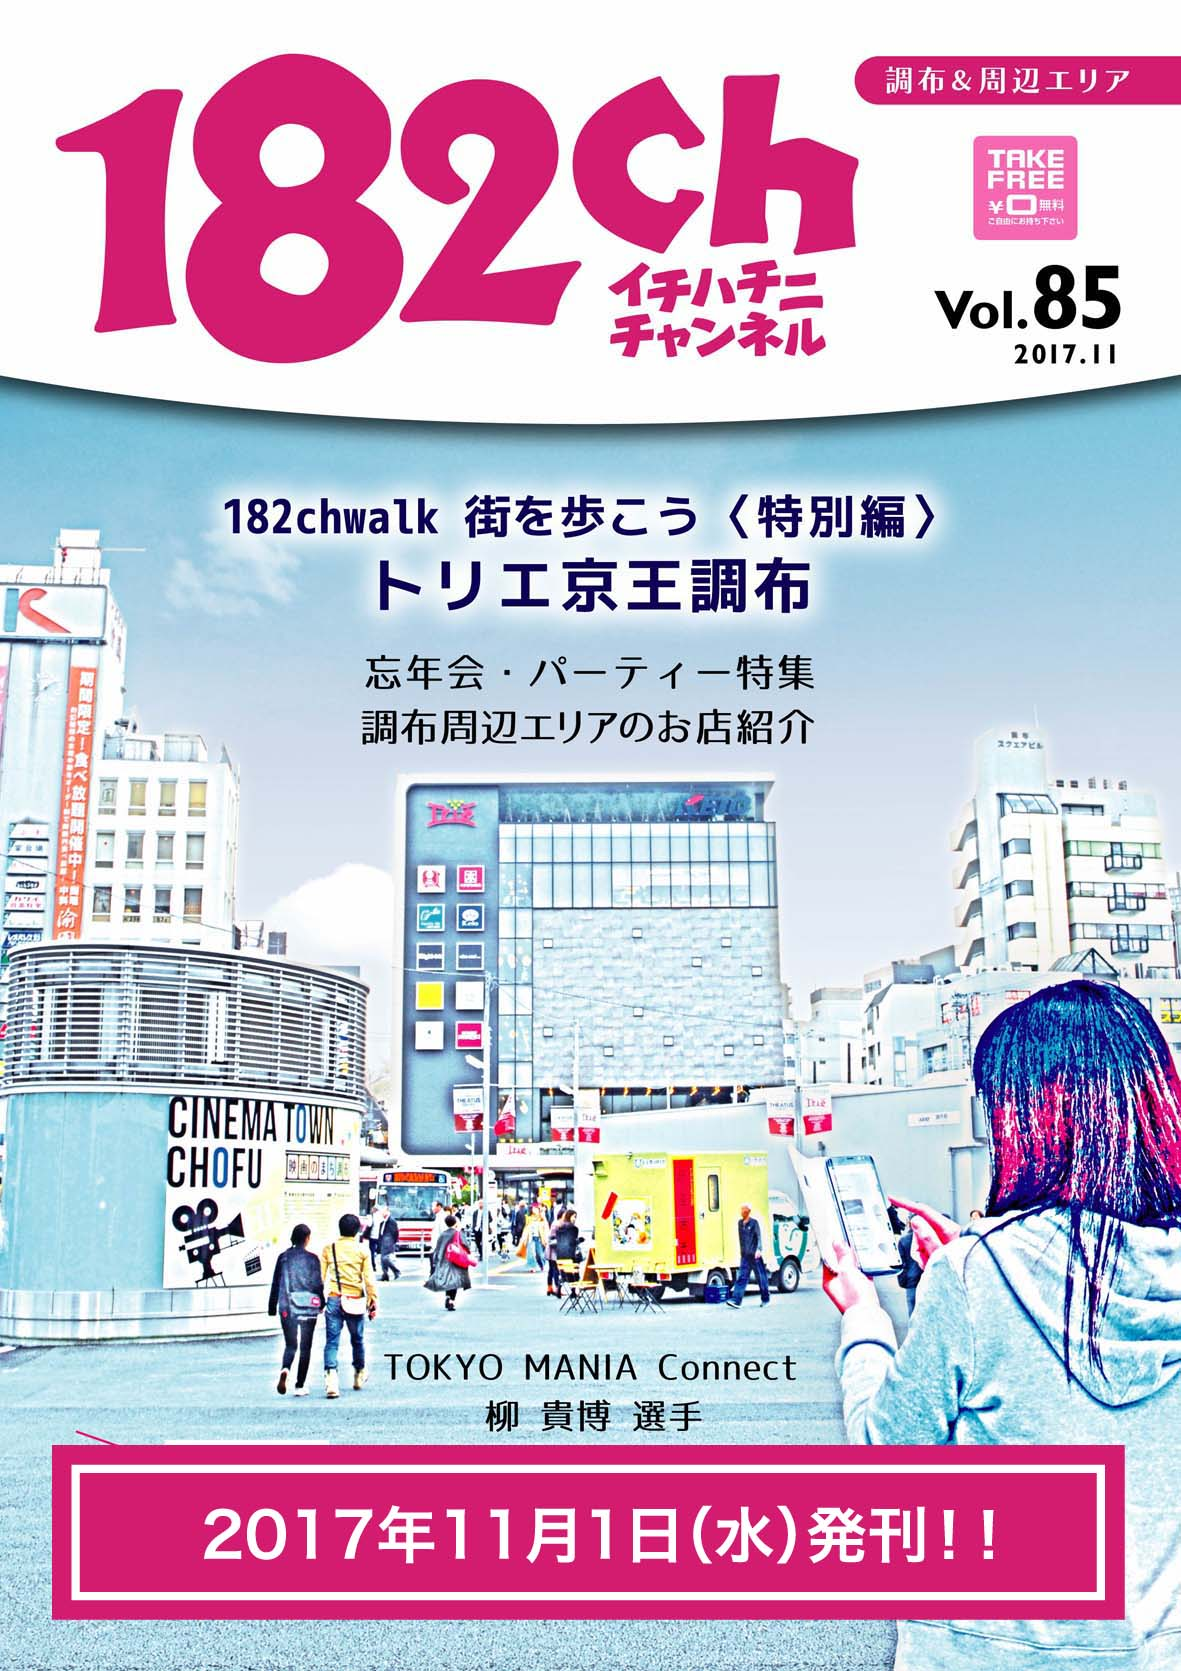 182ch vol.85